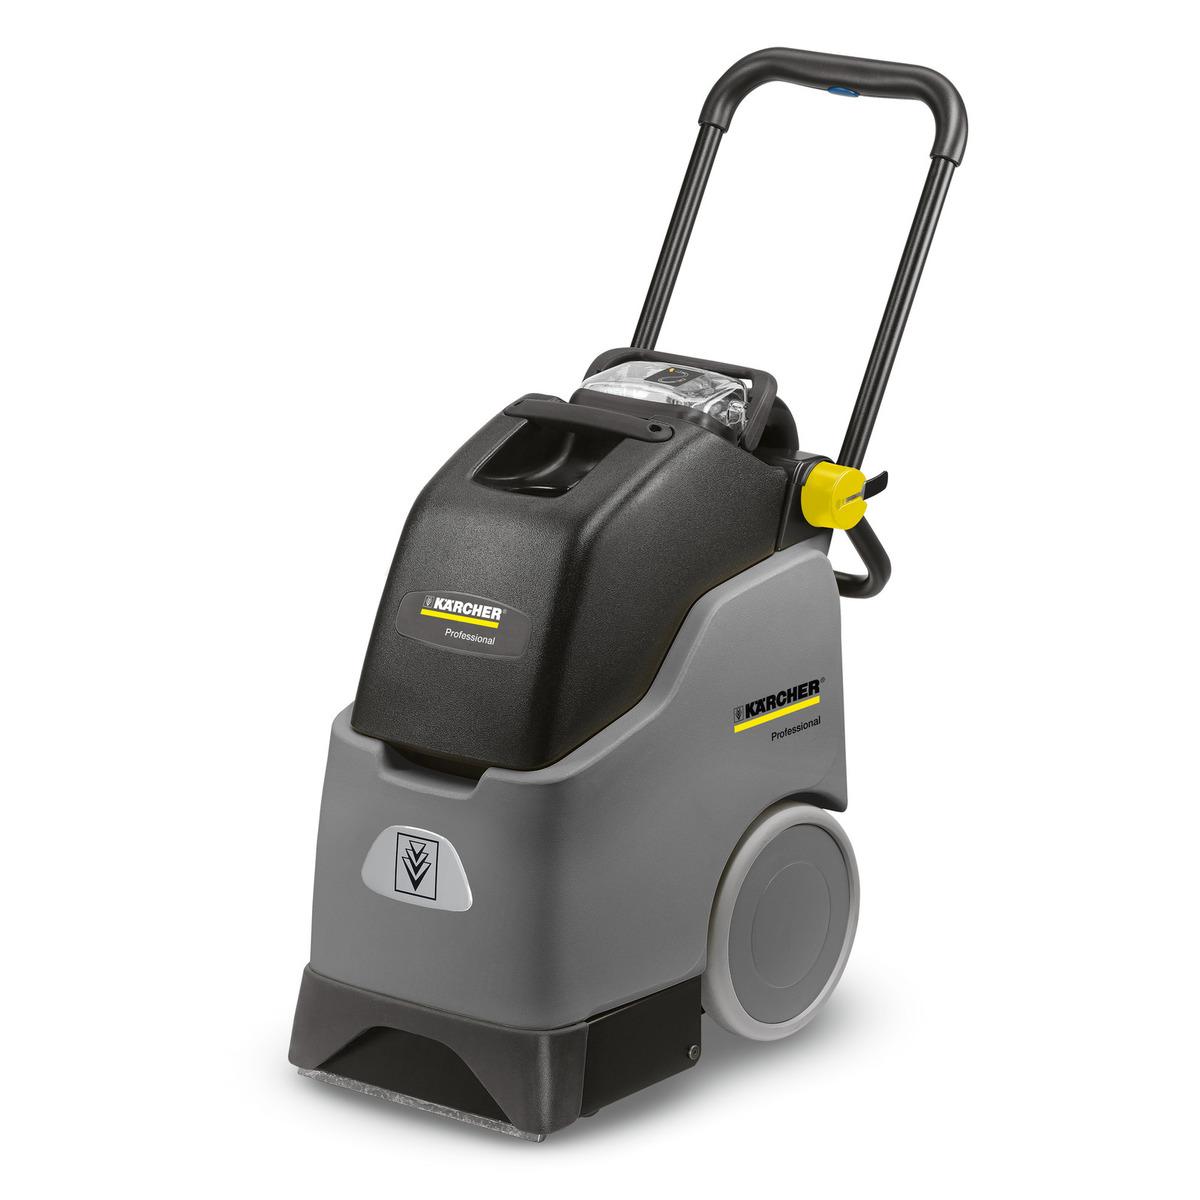 BRC 30/15 C地毯清洗机